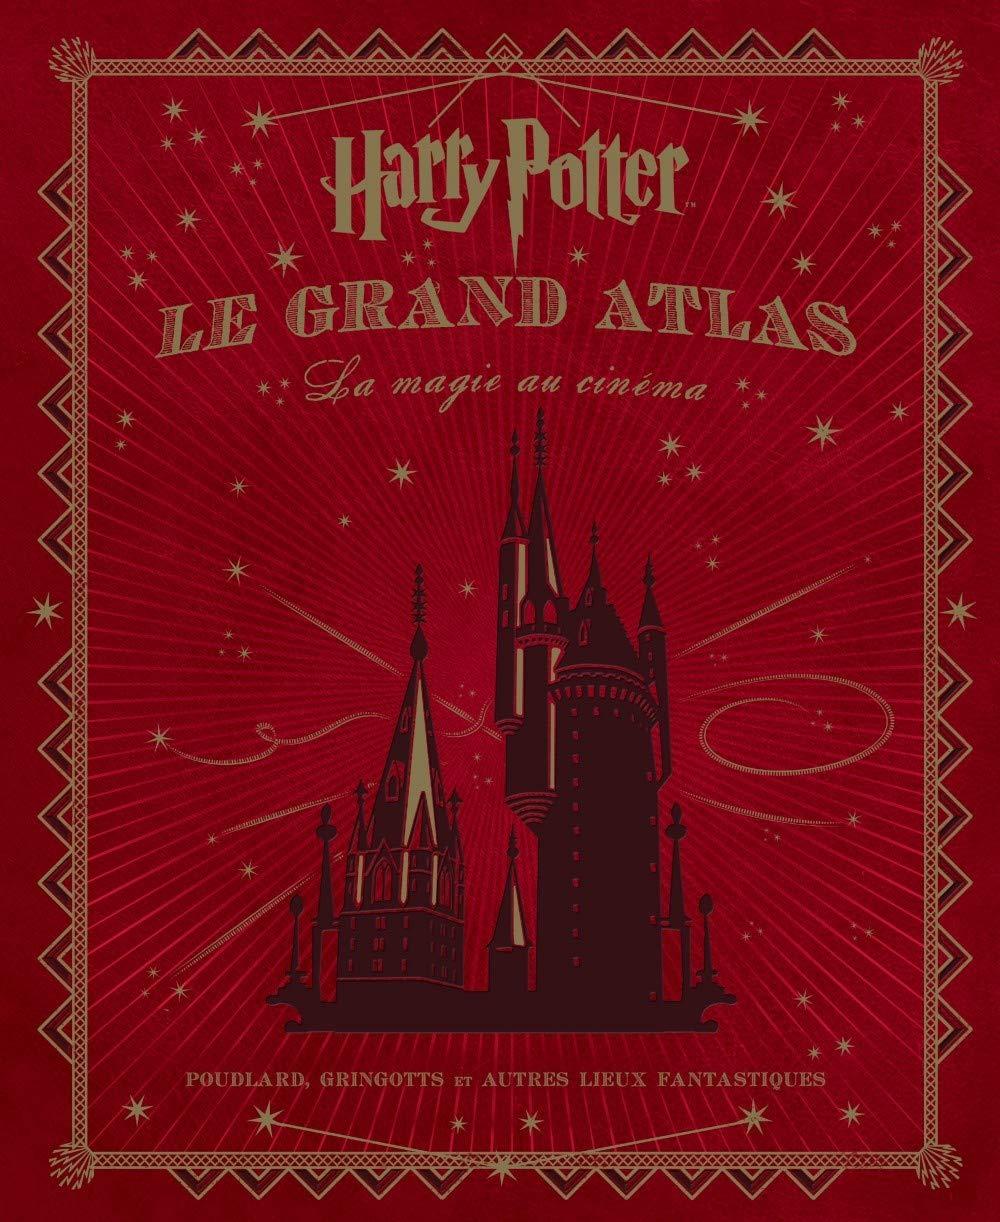 Harry Potter Grand Atlas